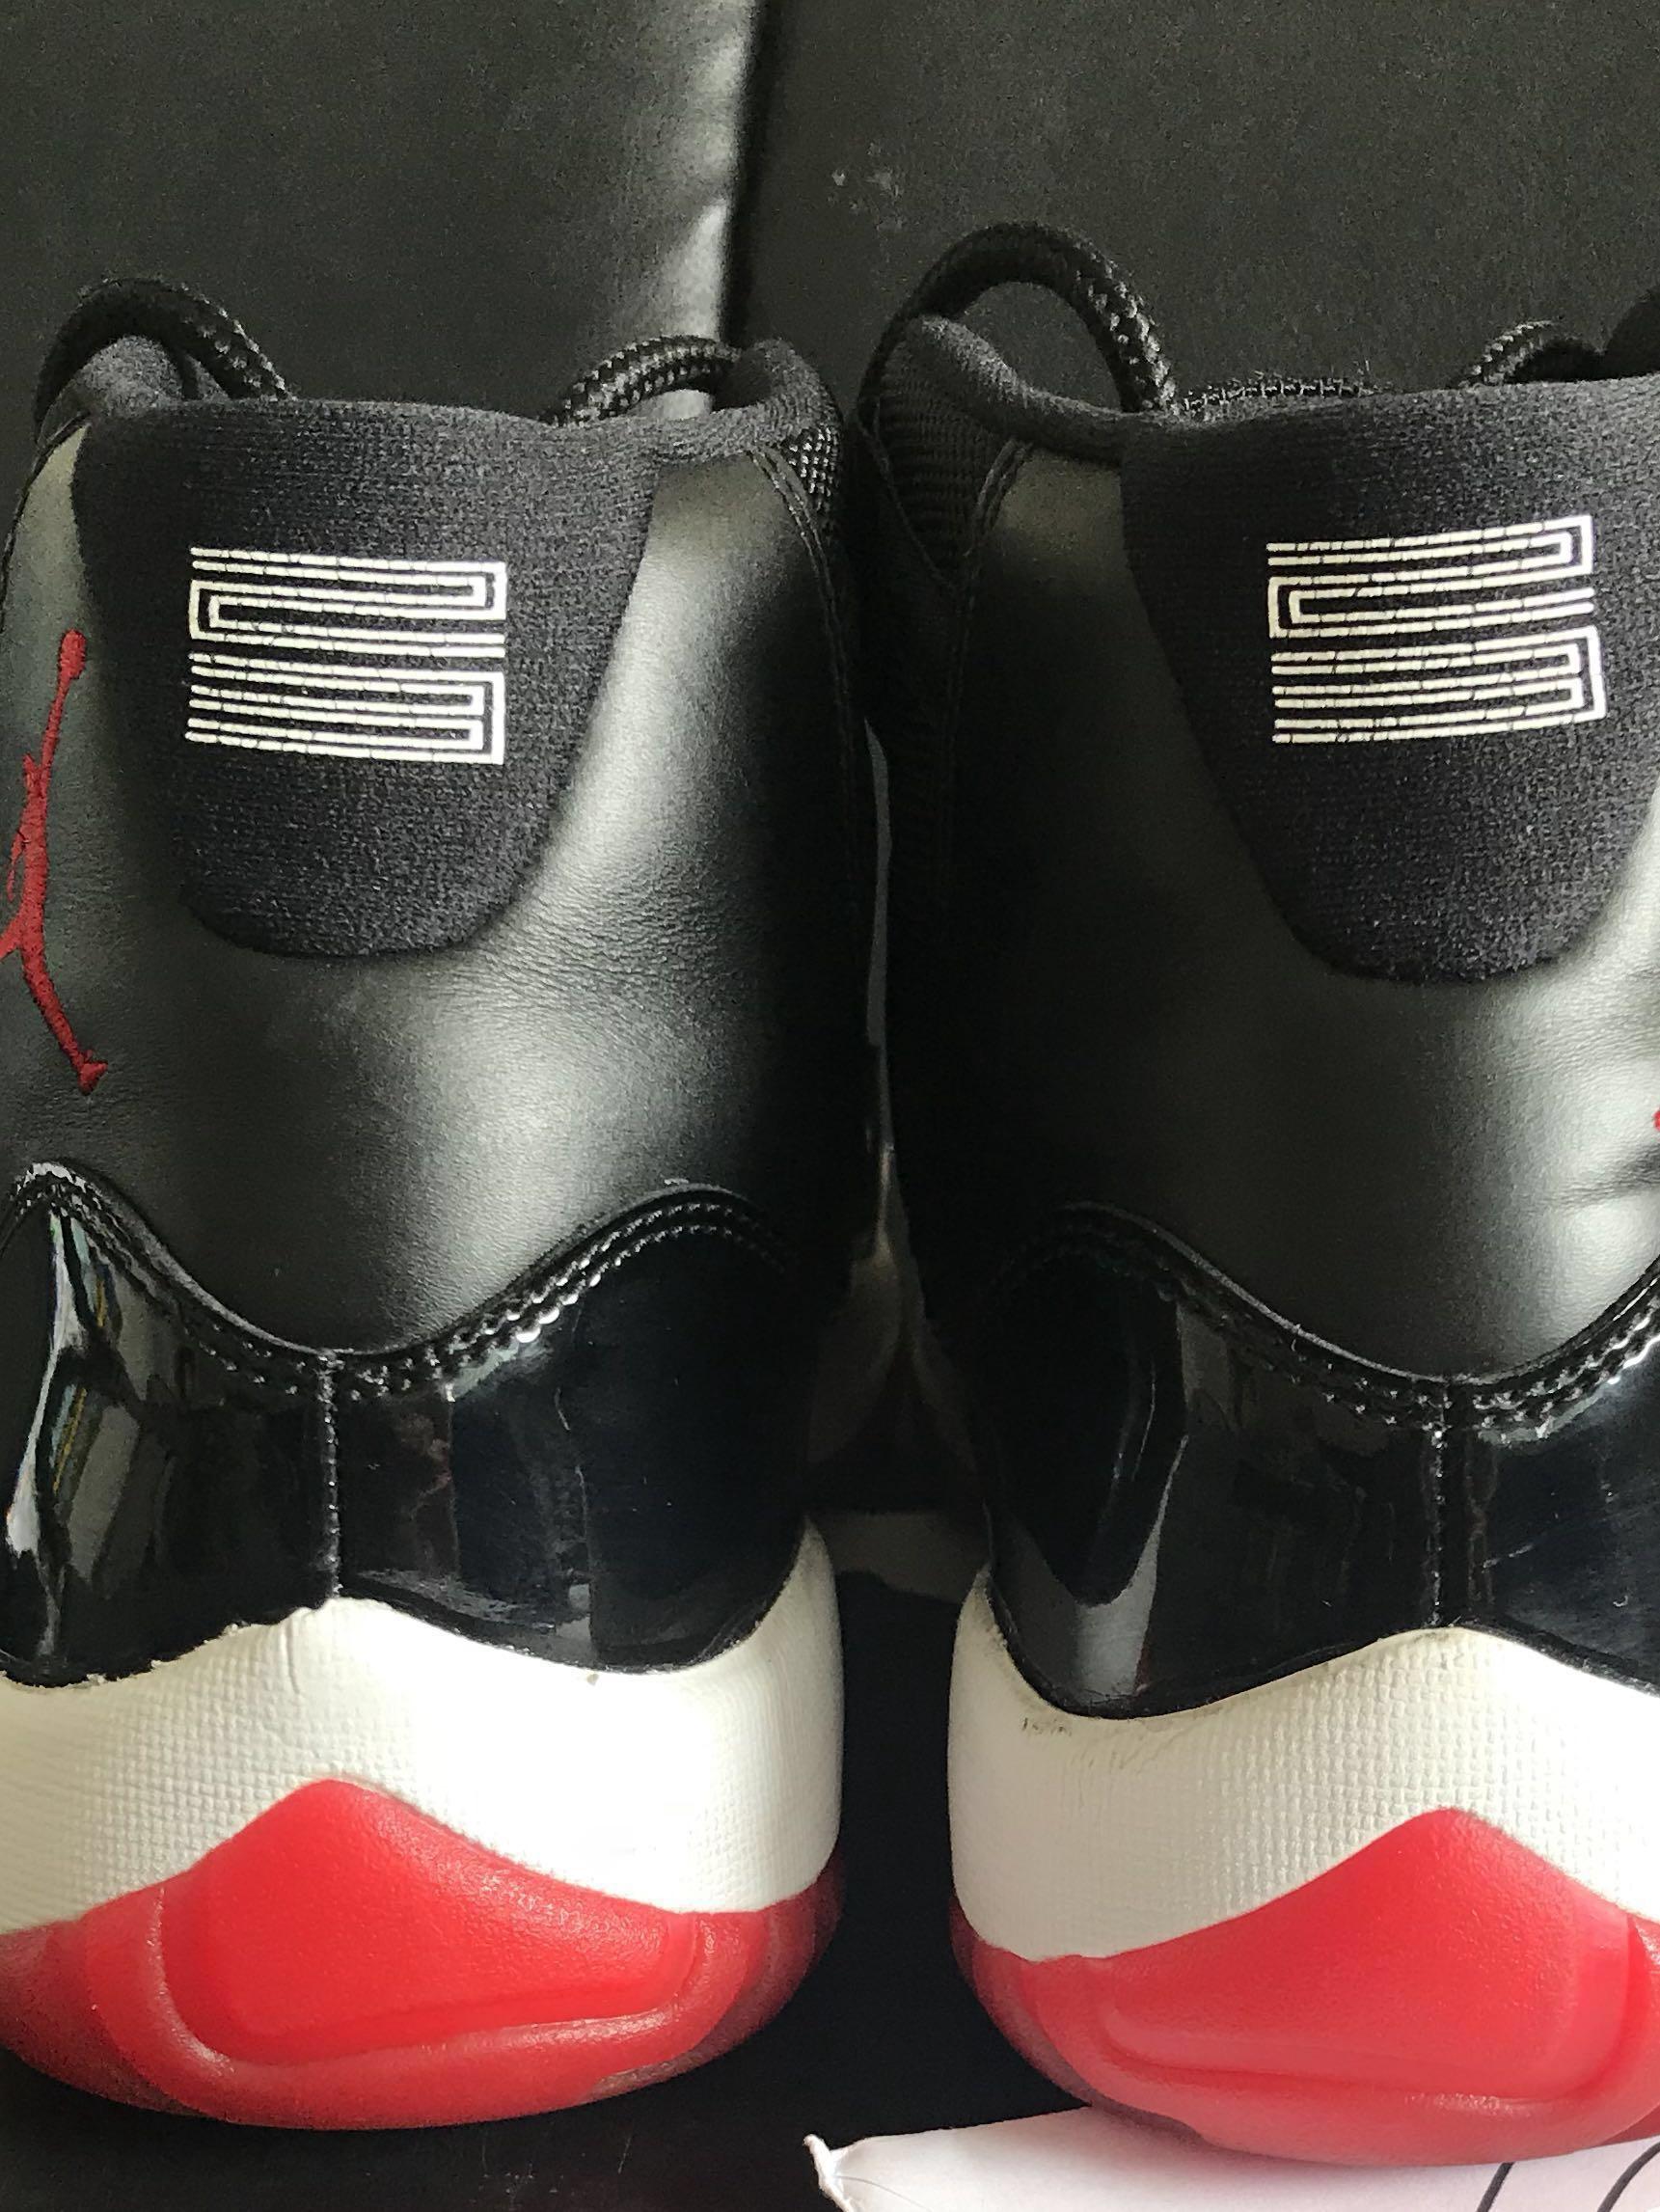 44255cdf566f86 Air Jordan 11 Bred Retro 2012